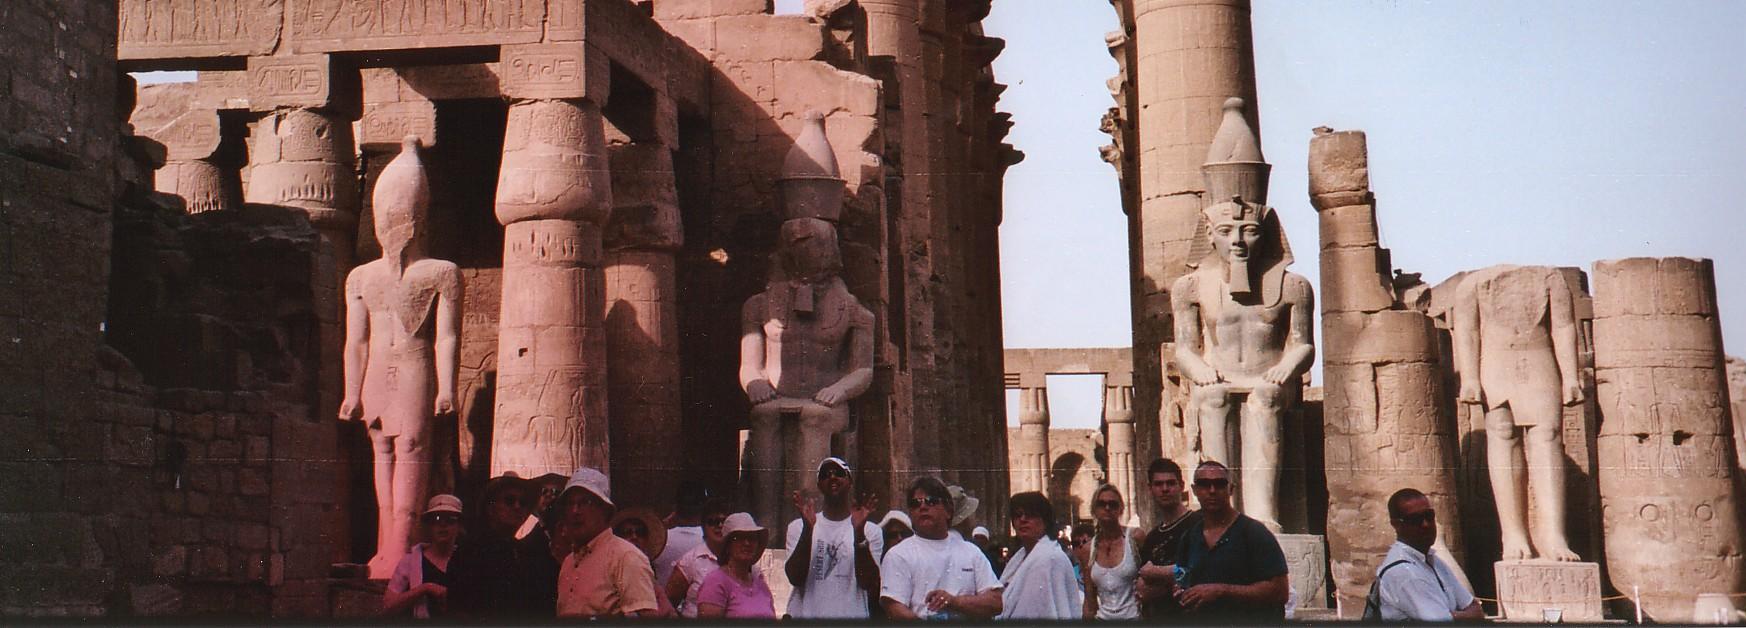 Karnak Temple - Cairo